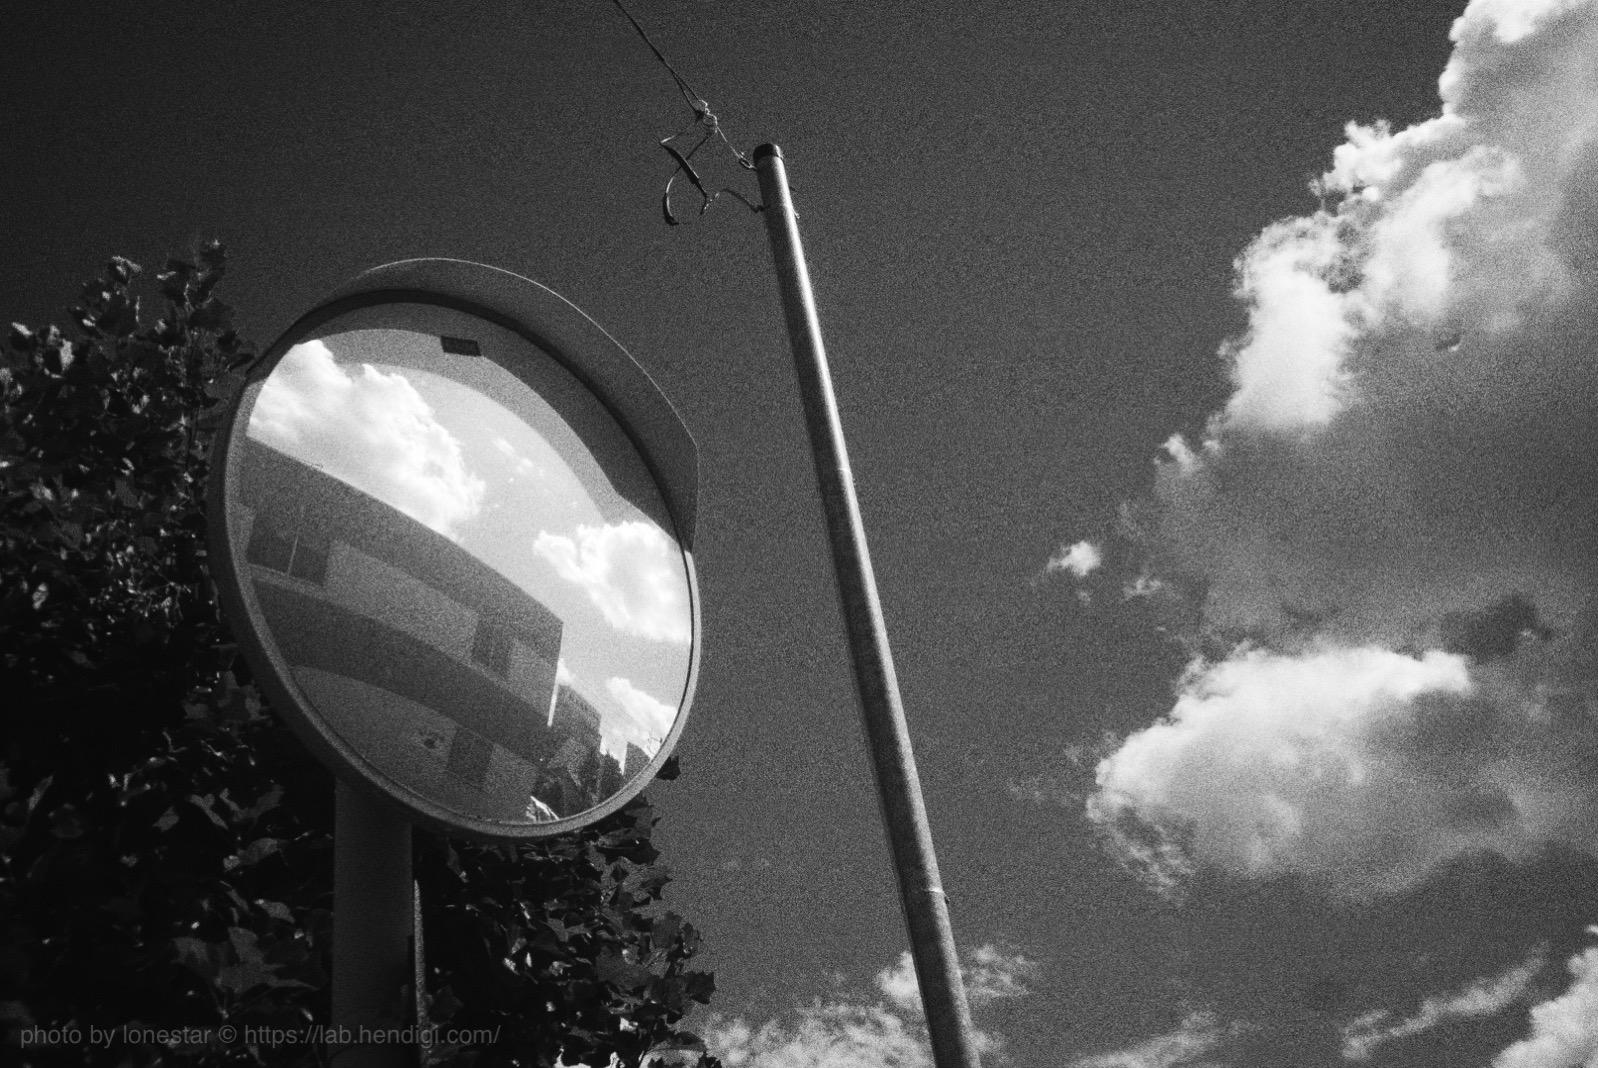 Wtulens L マイクロフォーサーズ 作例写真